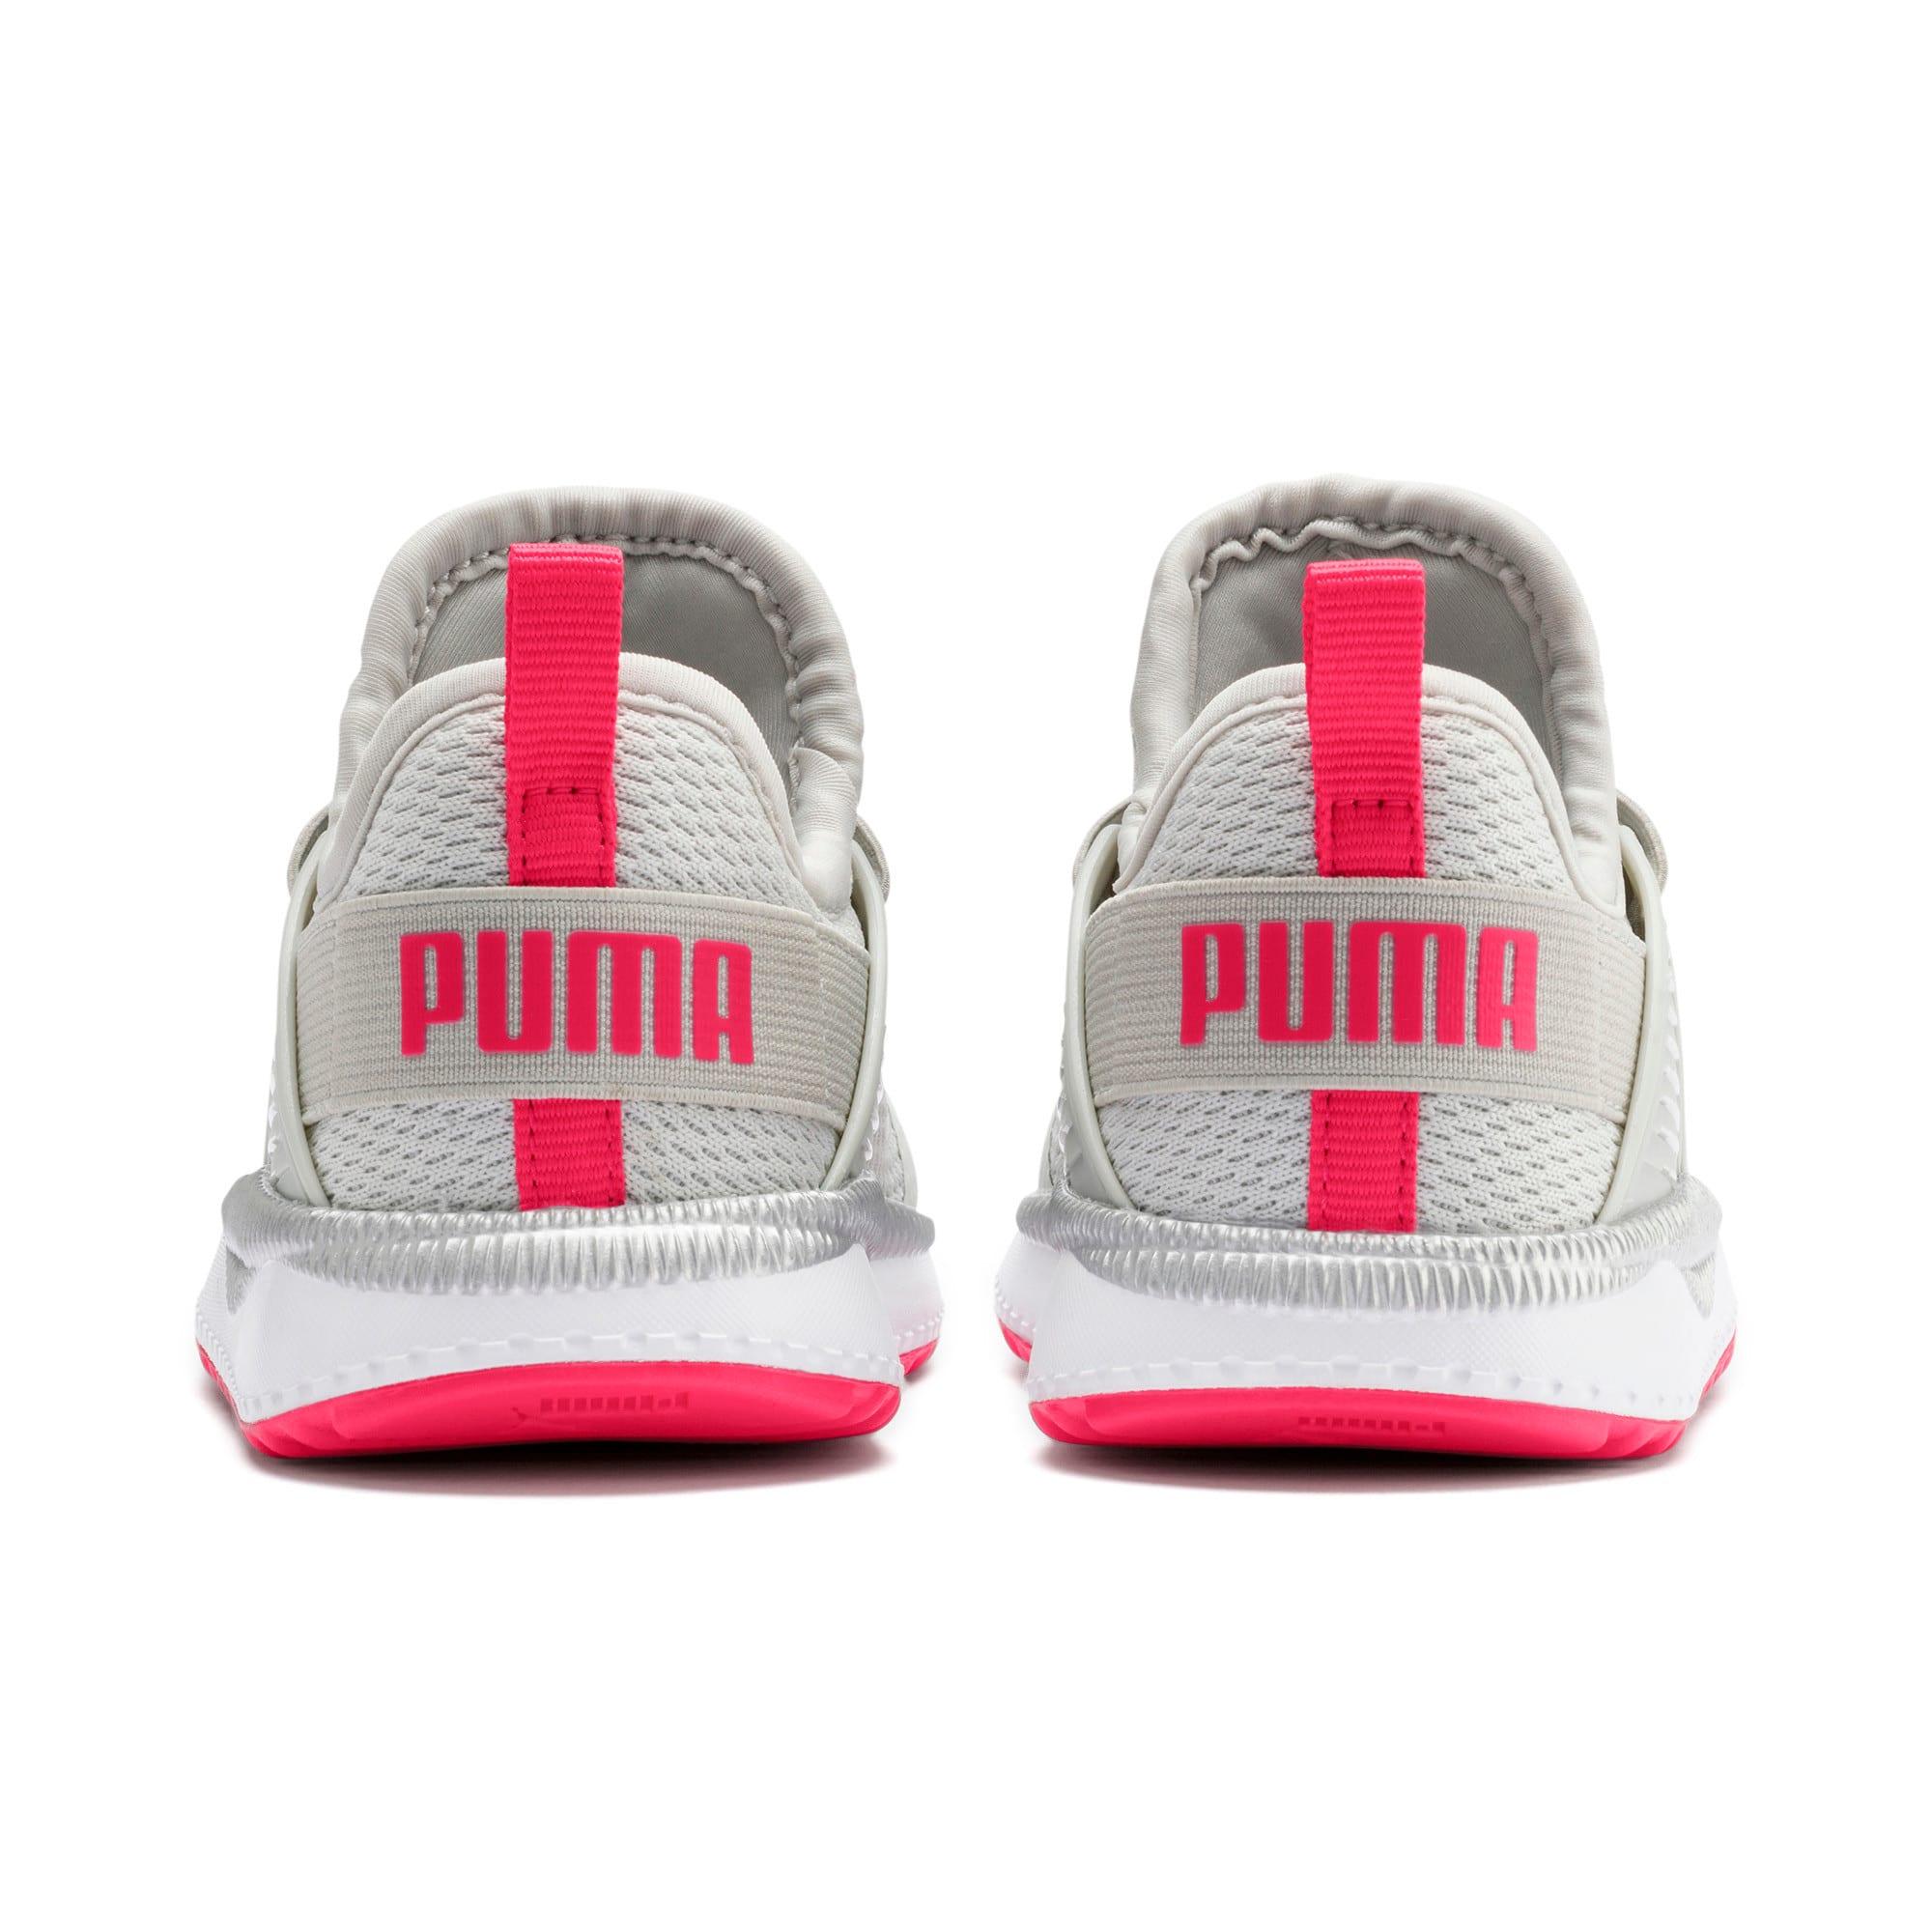 Thumbnail 3 of Pacer Next Cage Metallic Toddler Shoes, Gray Violet-Nrgy Rose, medium